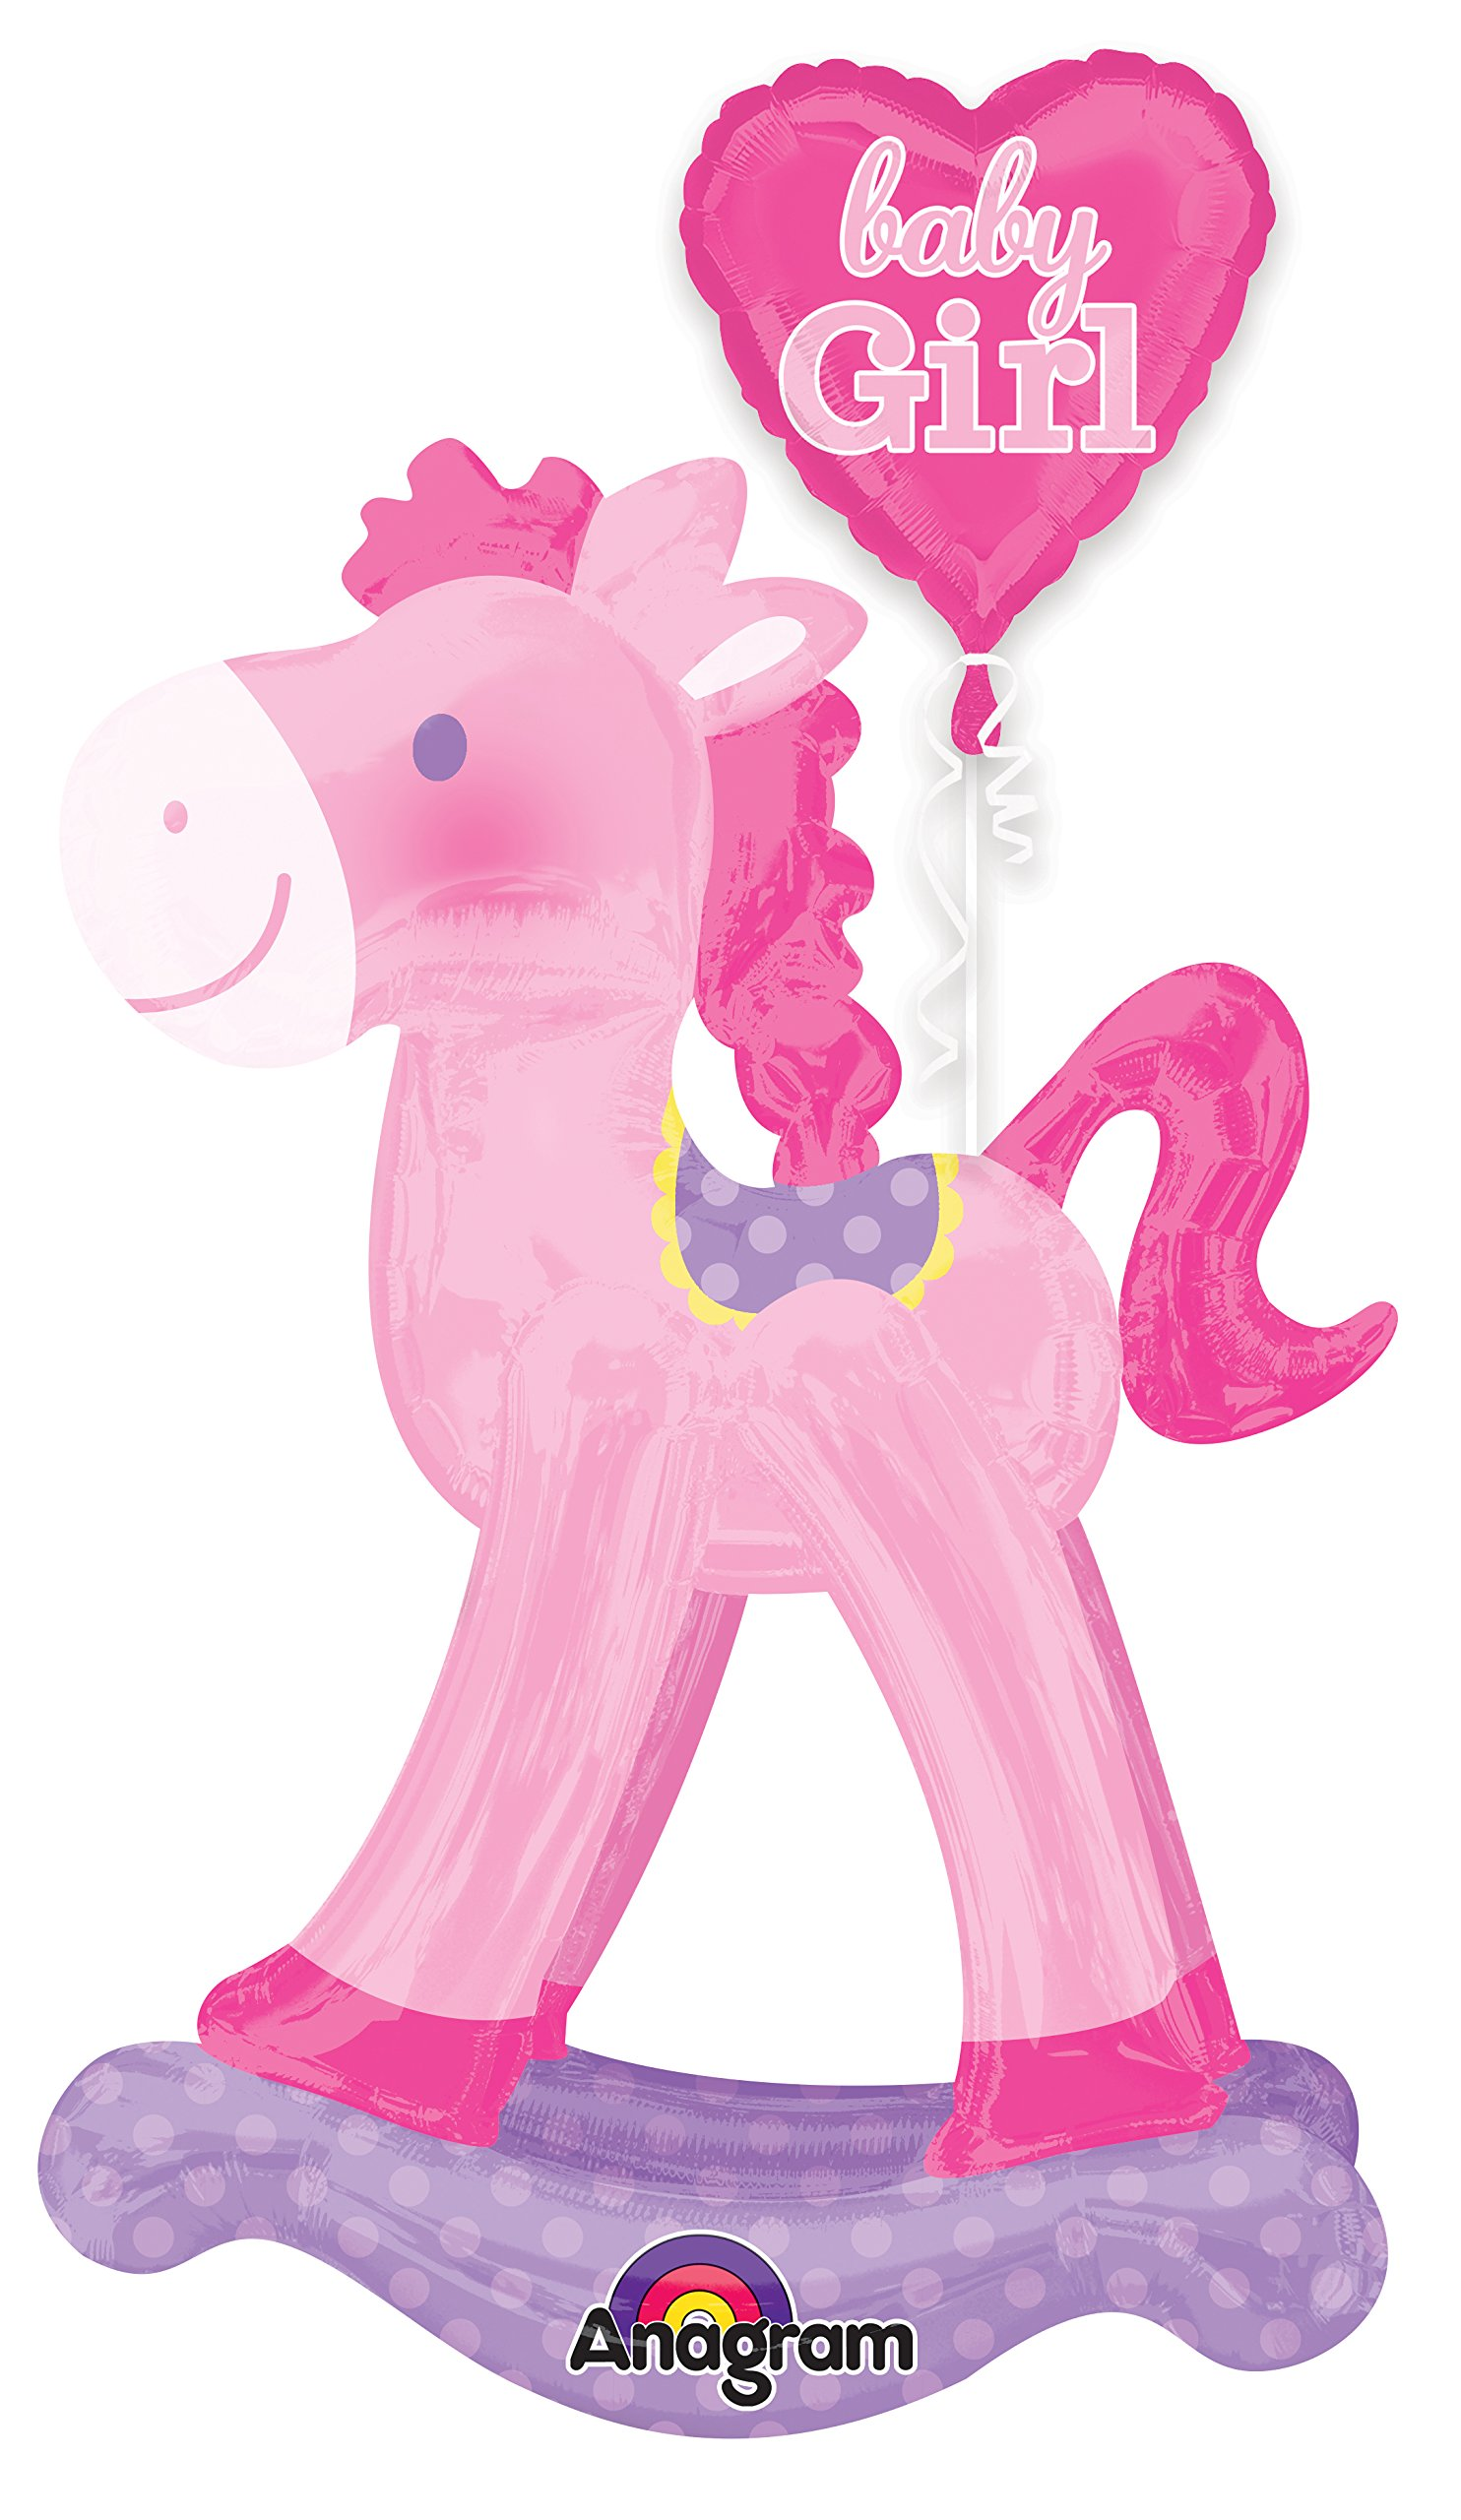 Anagram International Rocking Horse Air Walker, Pink